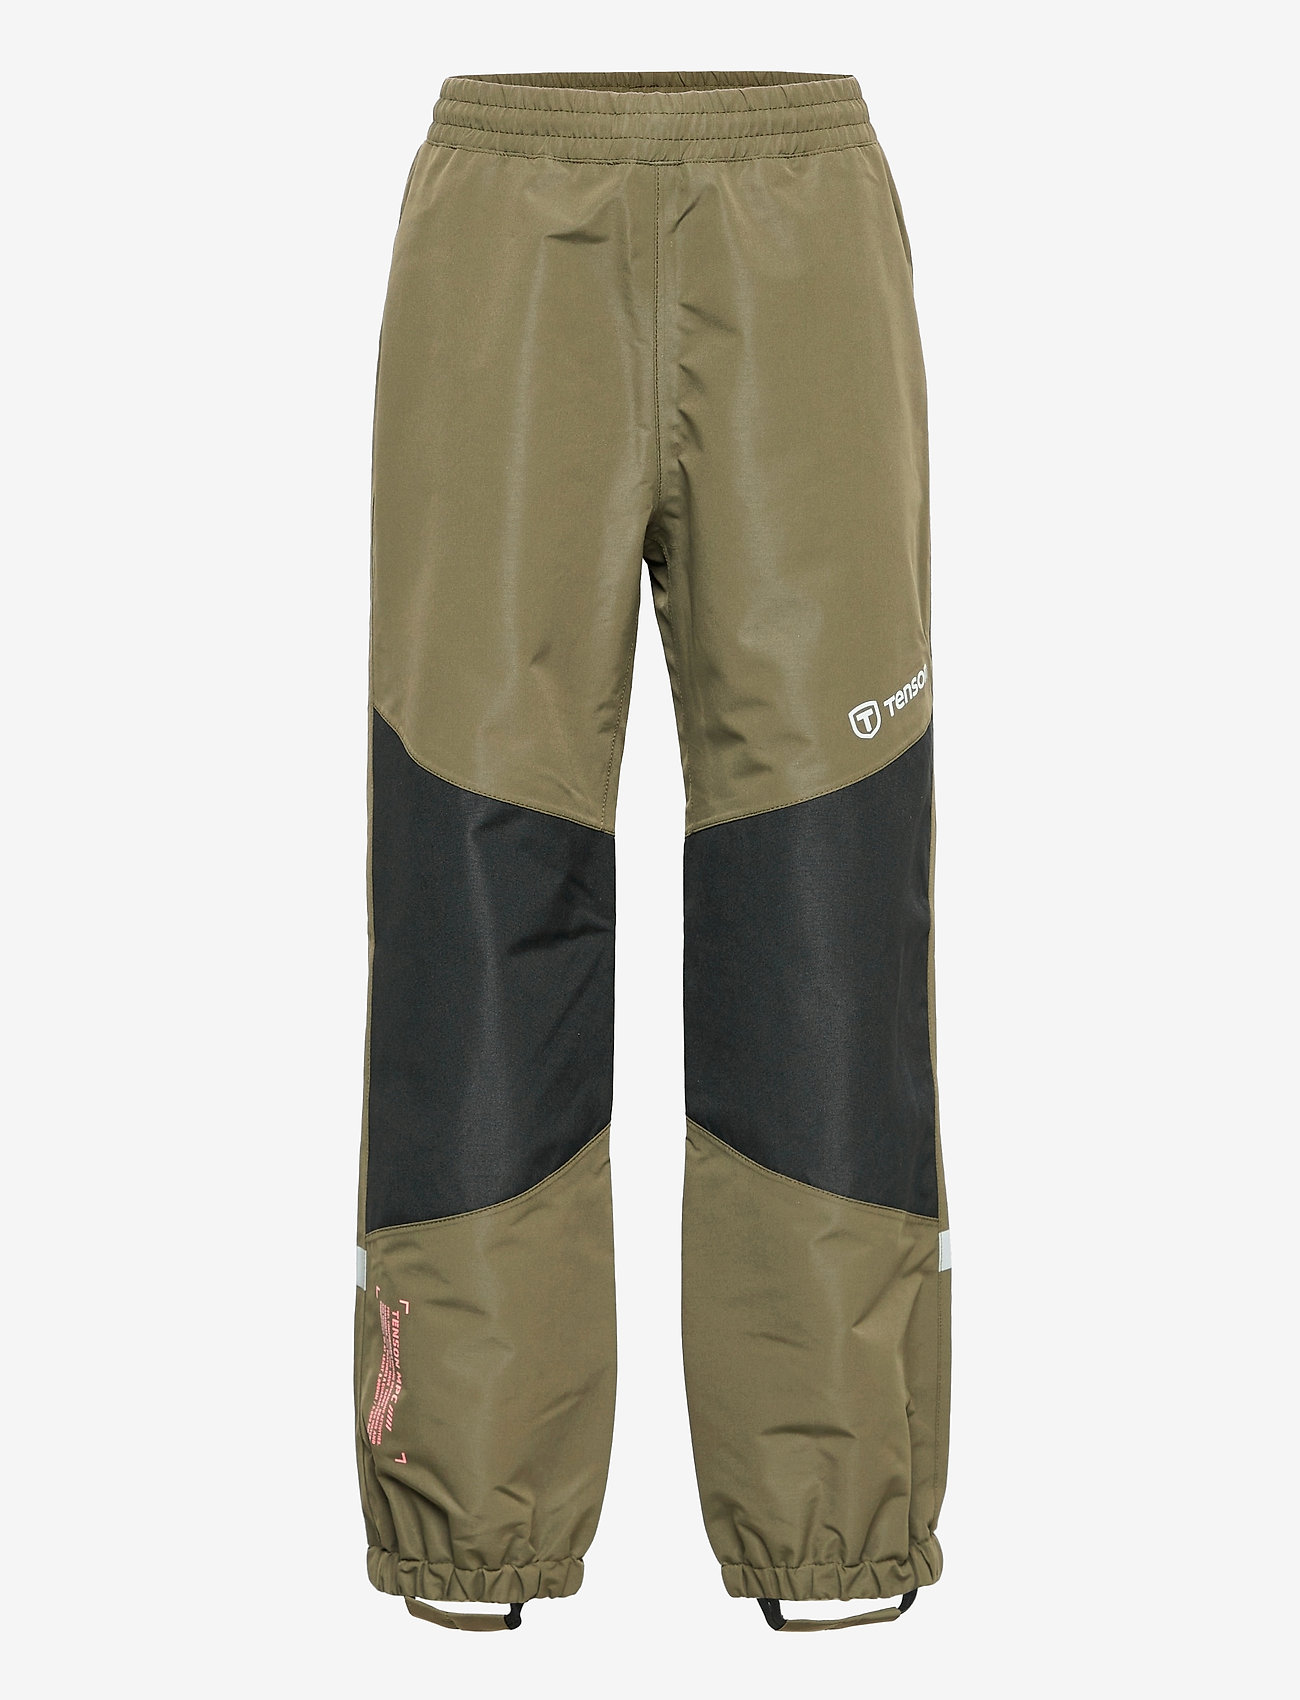 Tenson - Shore pants jr - shell- & regenbroeken - khaki - 0